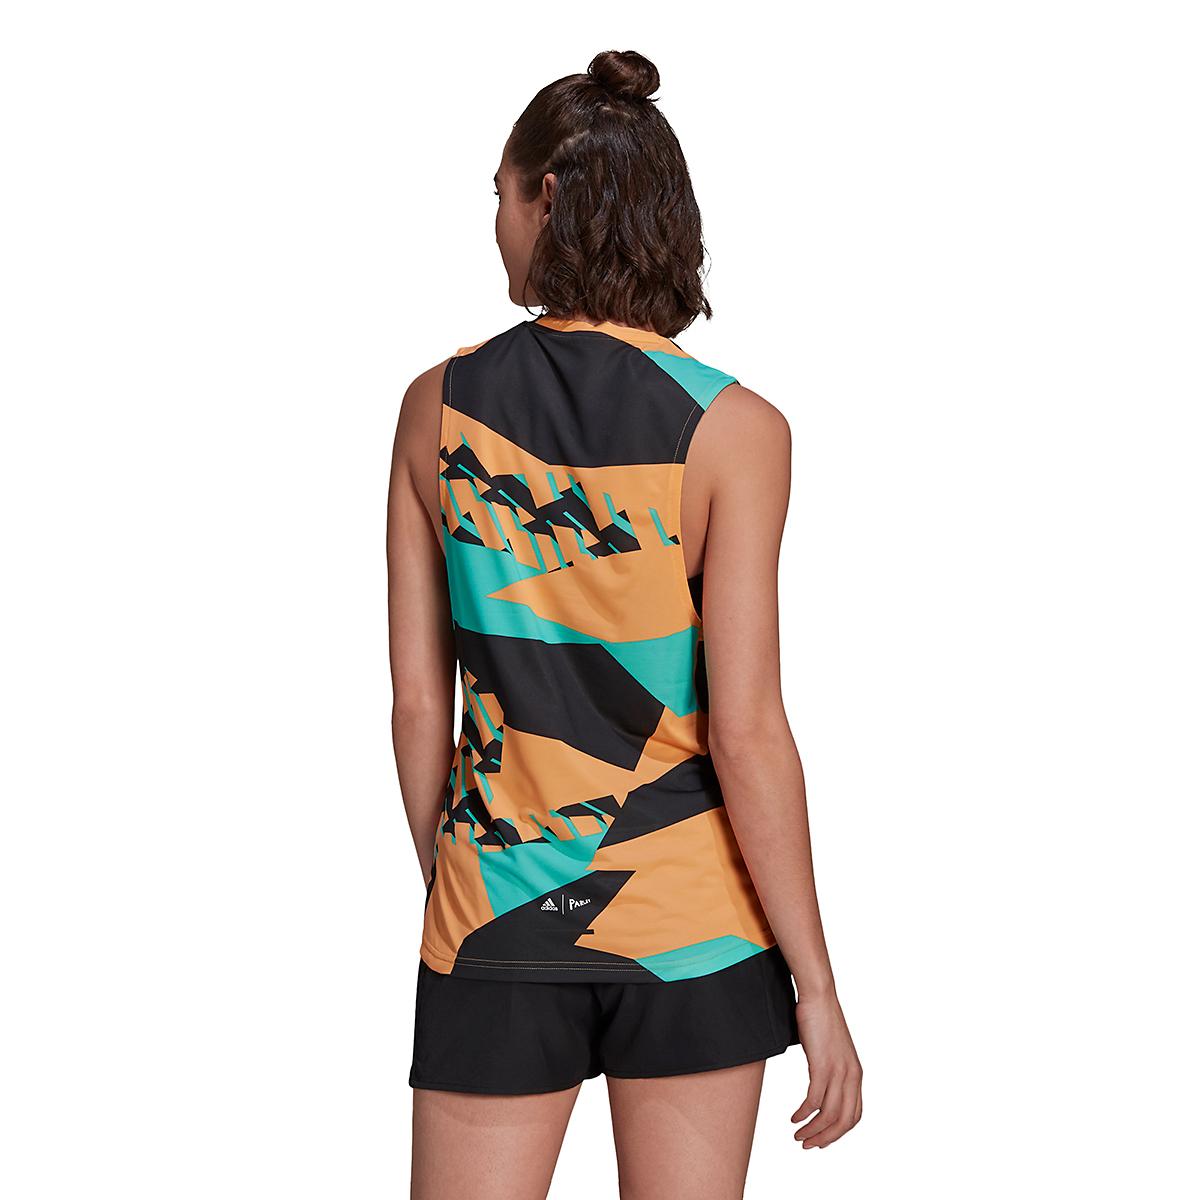 Women's Adidas Terrex Parley Agravic TR Tank Top - Color: Hazy Orange - Size: XS, Hazy Orange, large, image 2